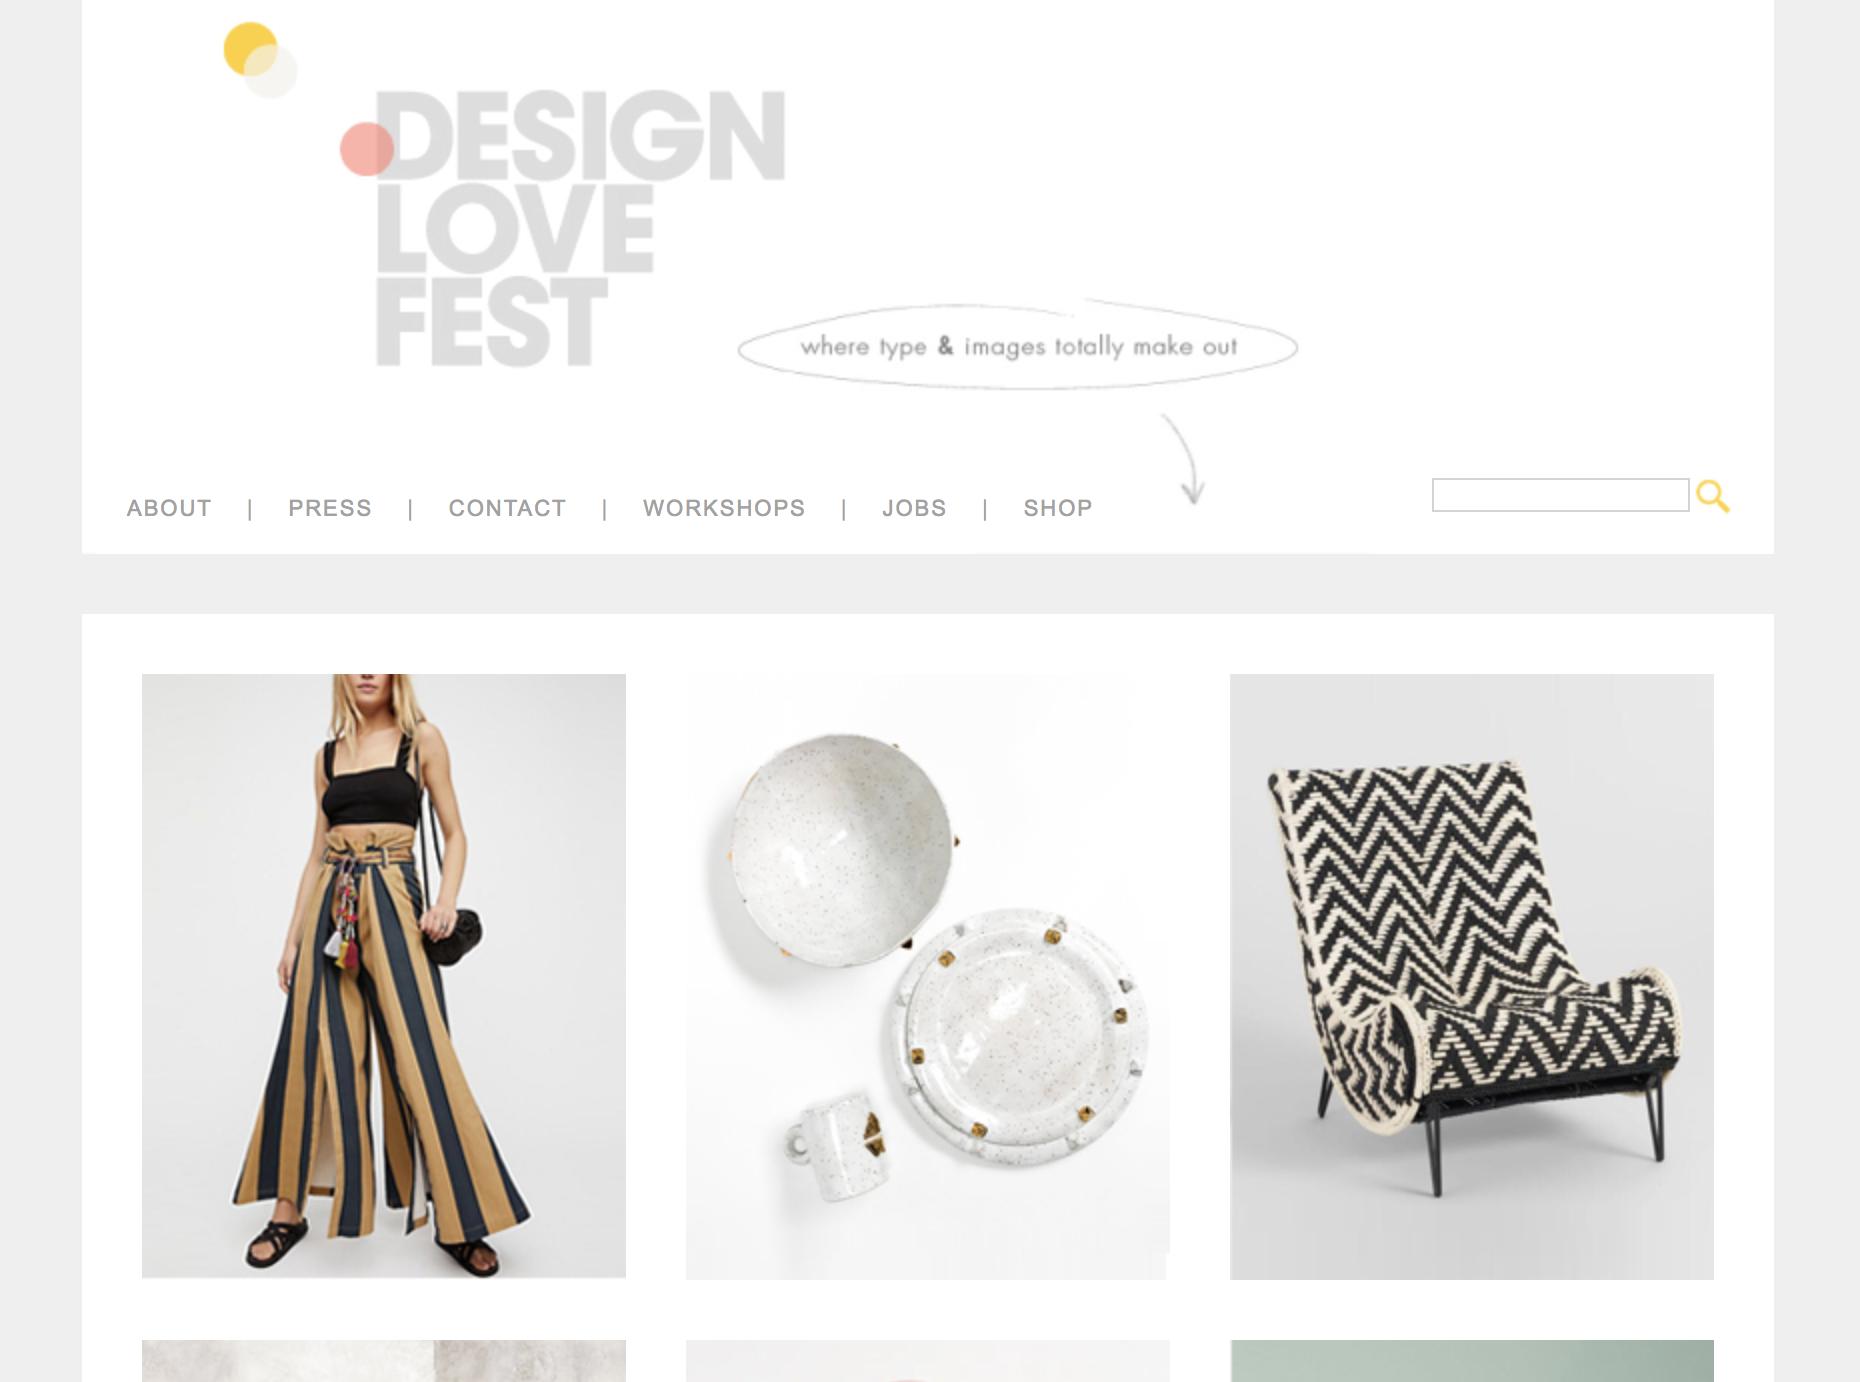 influencer marketing diseño amor fest